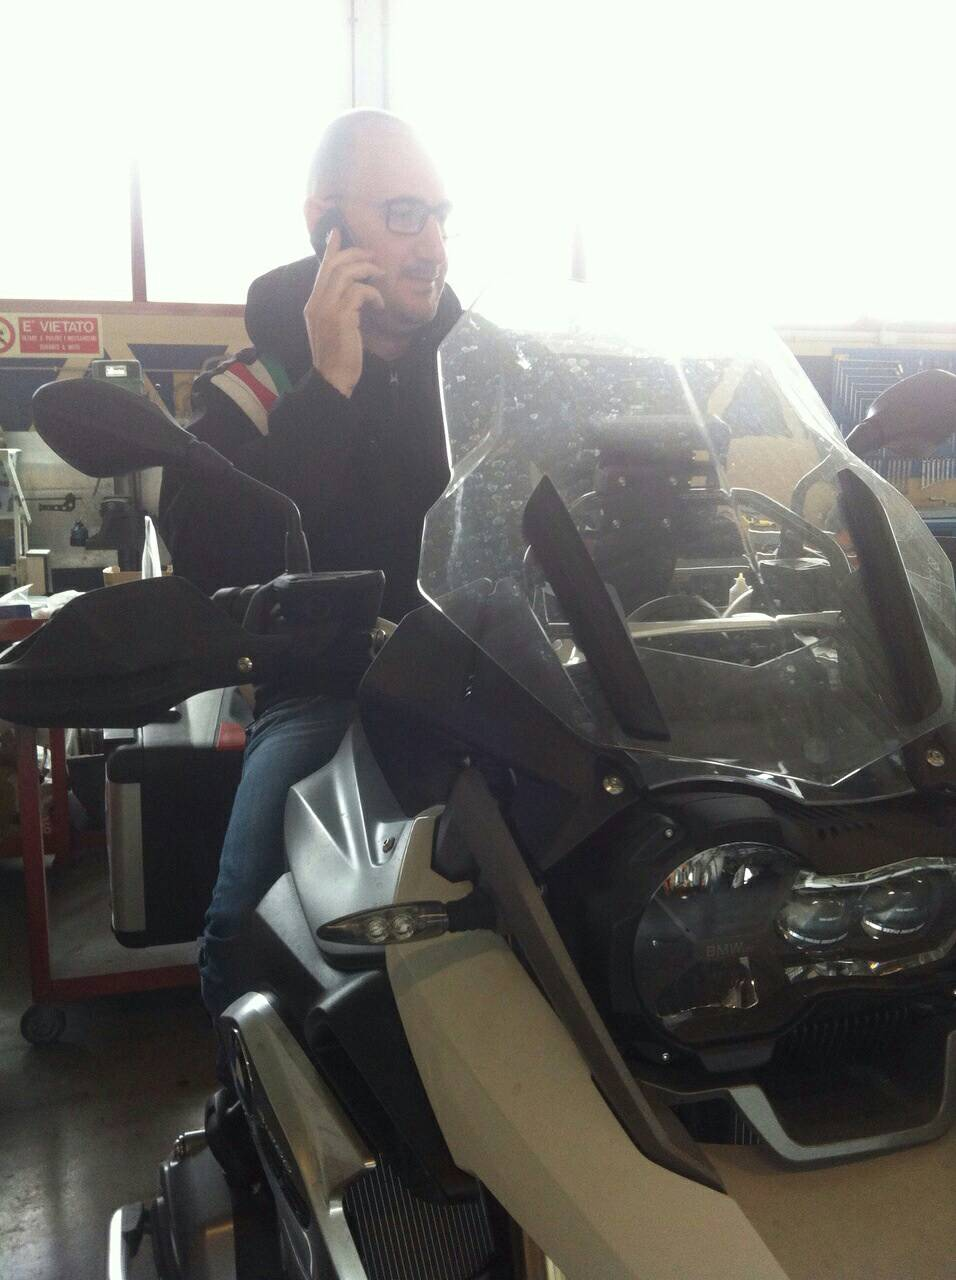 0d173d21eb88b92d1a30e14d564455d3 - Test ride: KTM 1290 Super Duke R